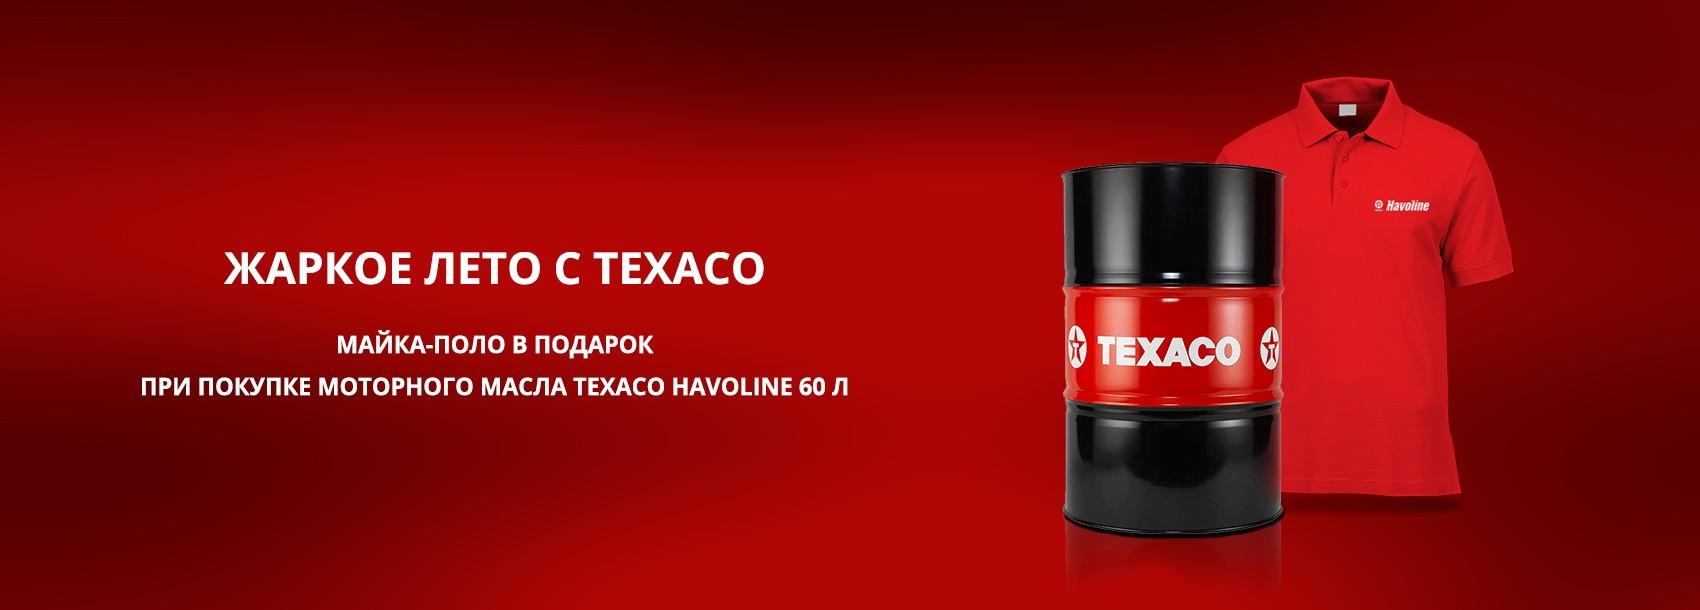 Жаркое лето с Texaco